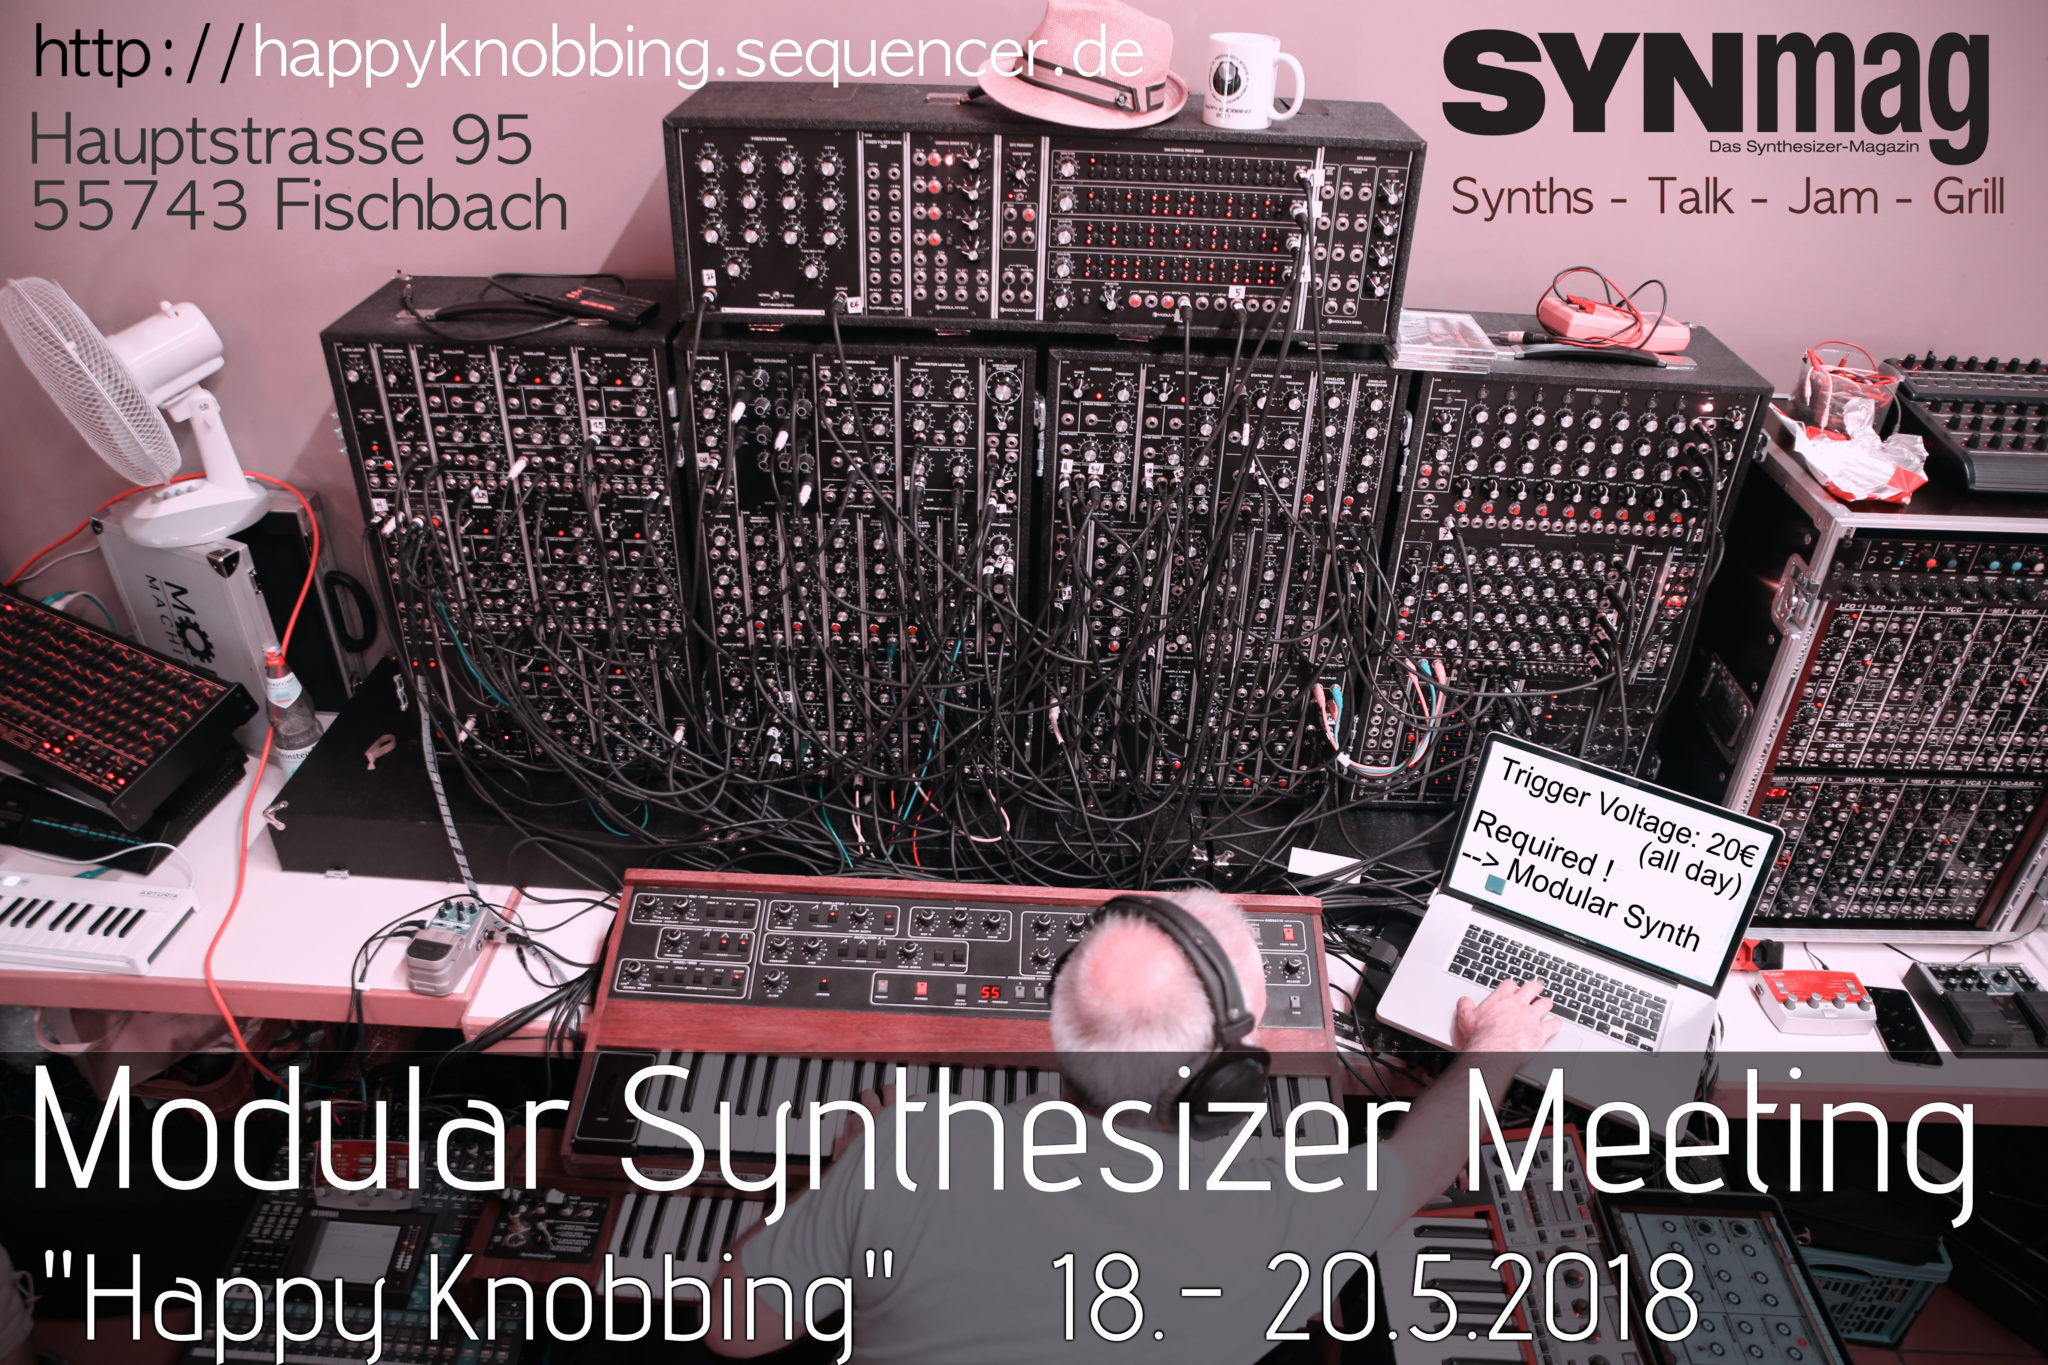 Happy Knobbing Modular Synth Meeting 2018 Flyer